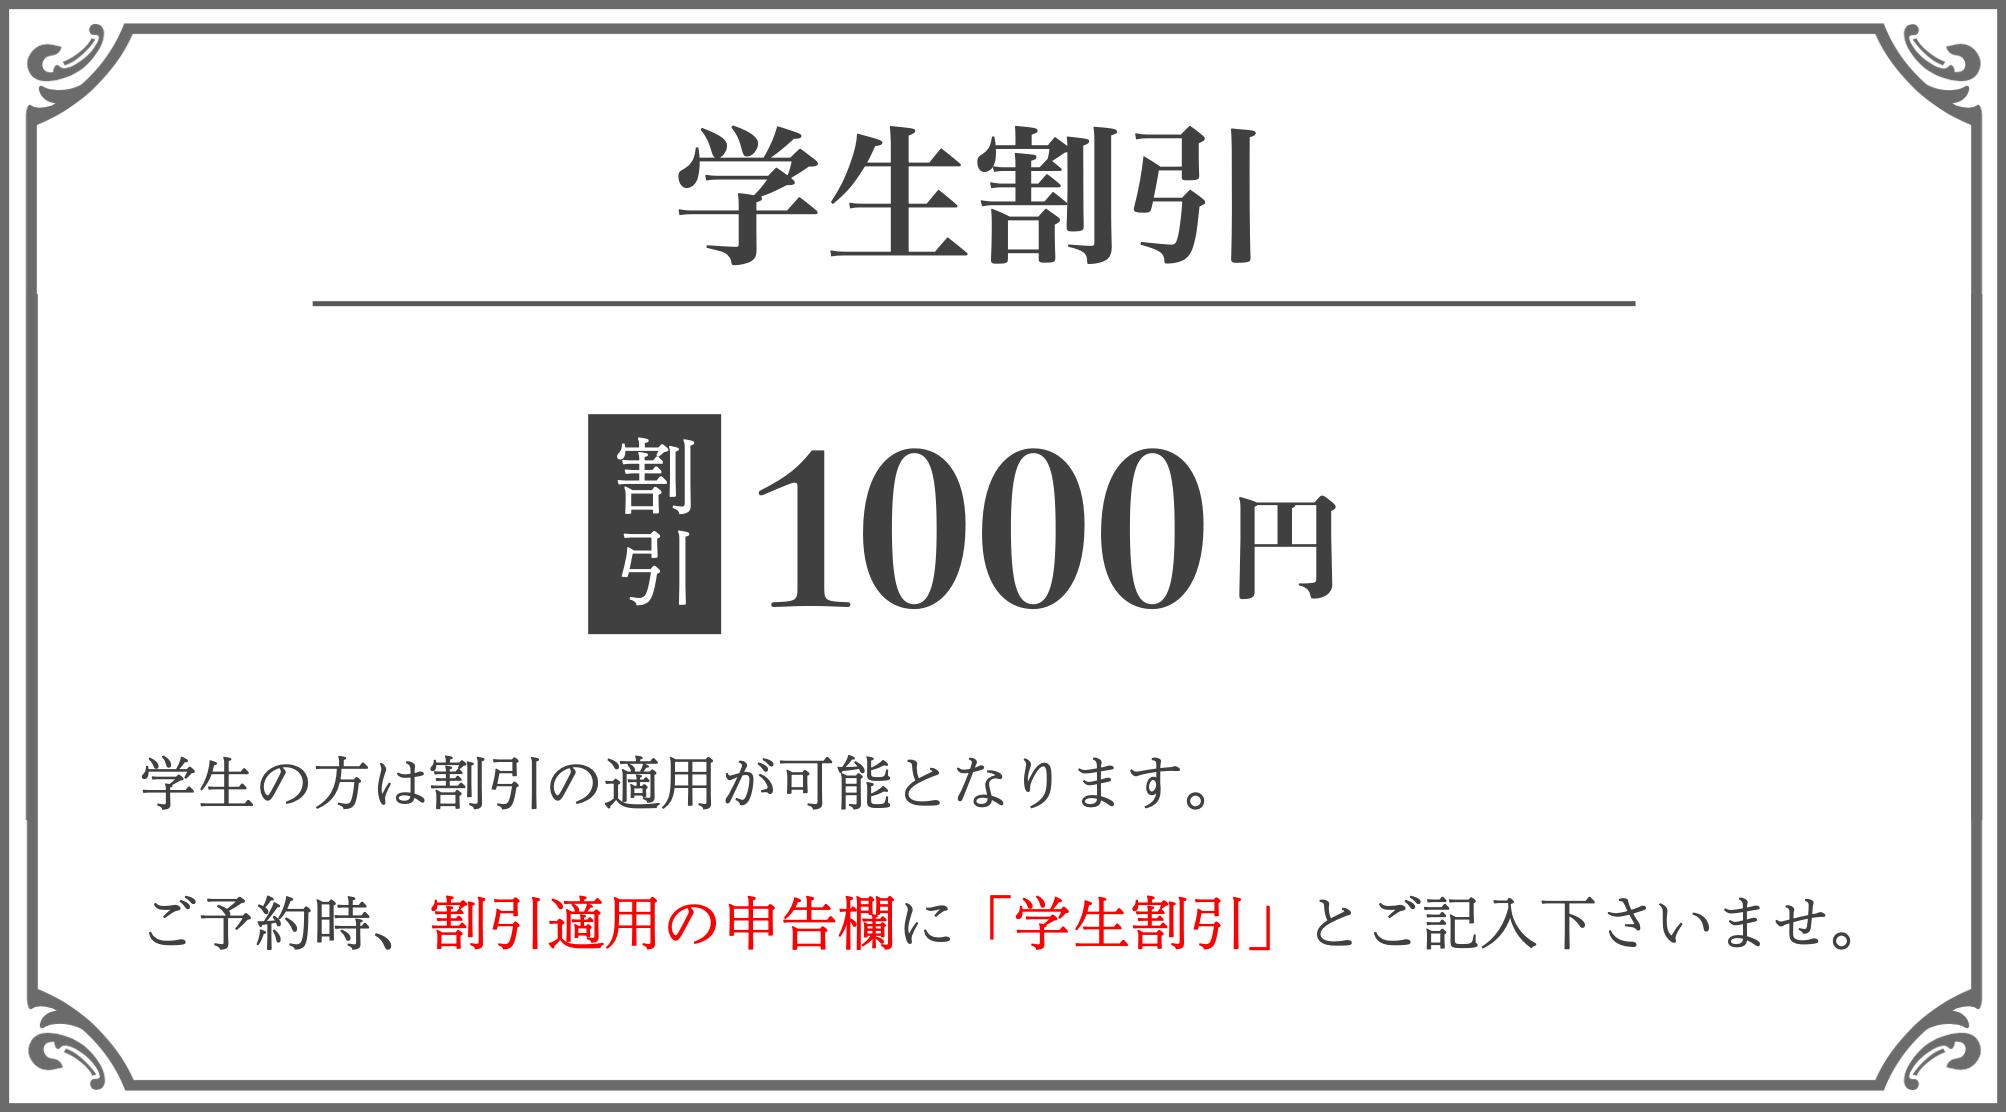 20200317102708